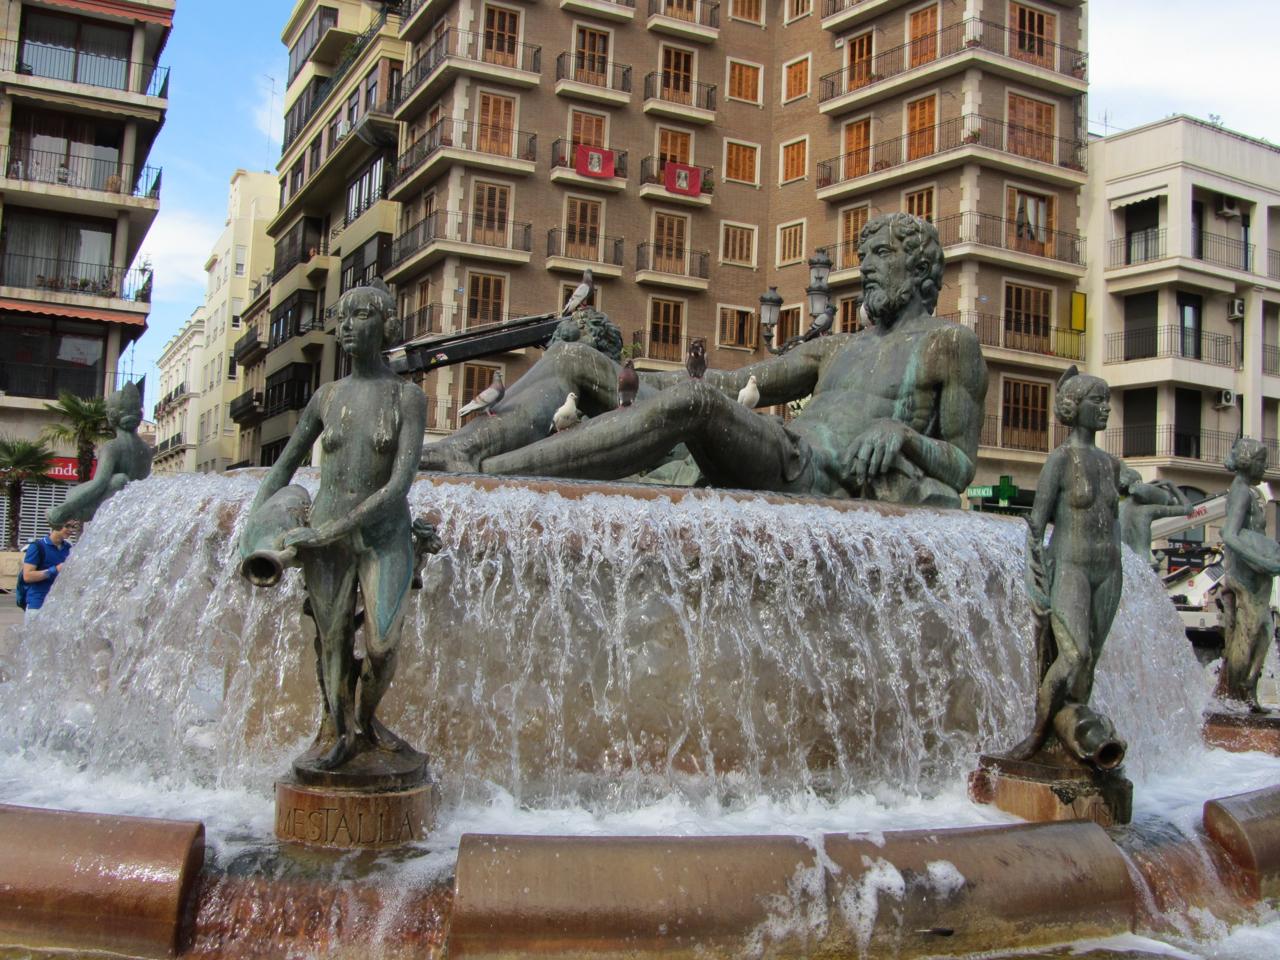 Turia-Brunnen auf dem Plaza de la Virgin